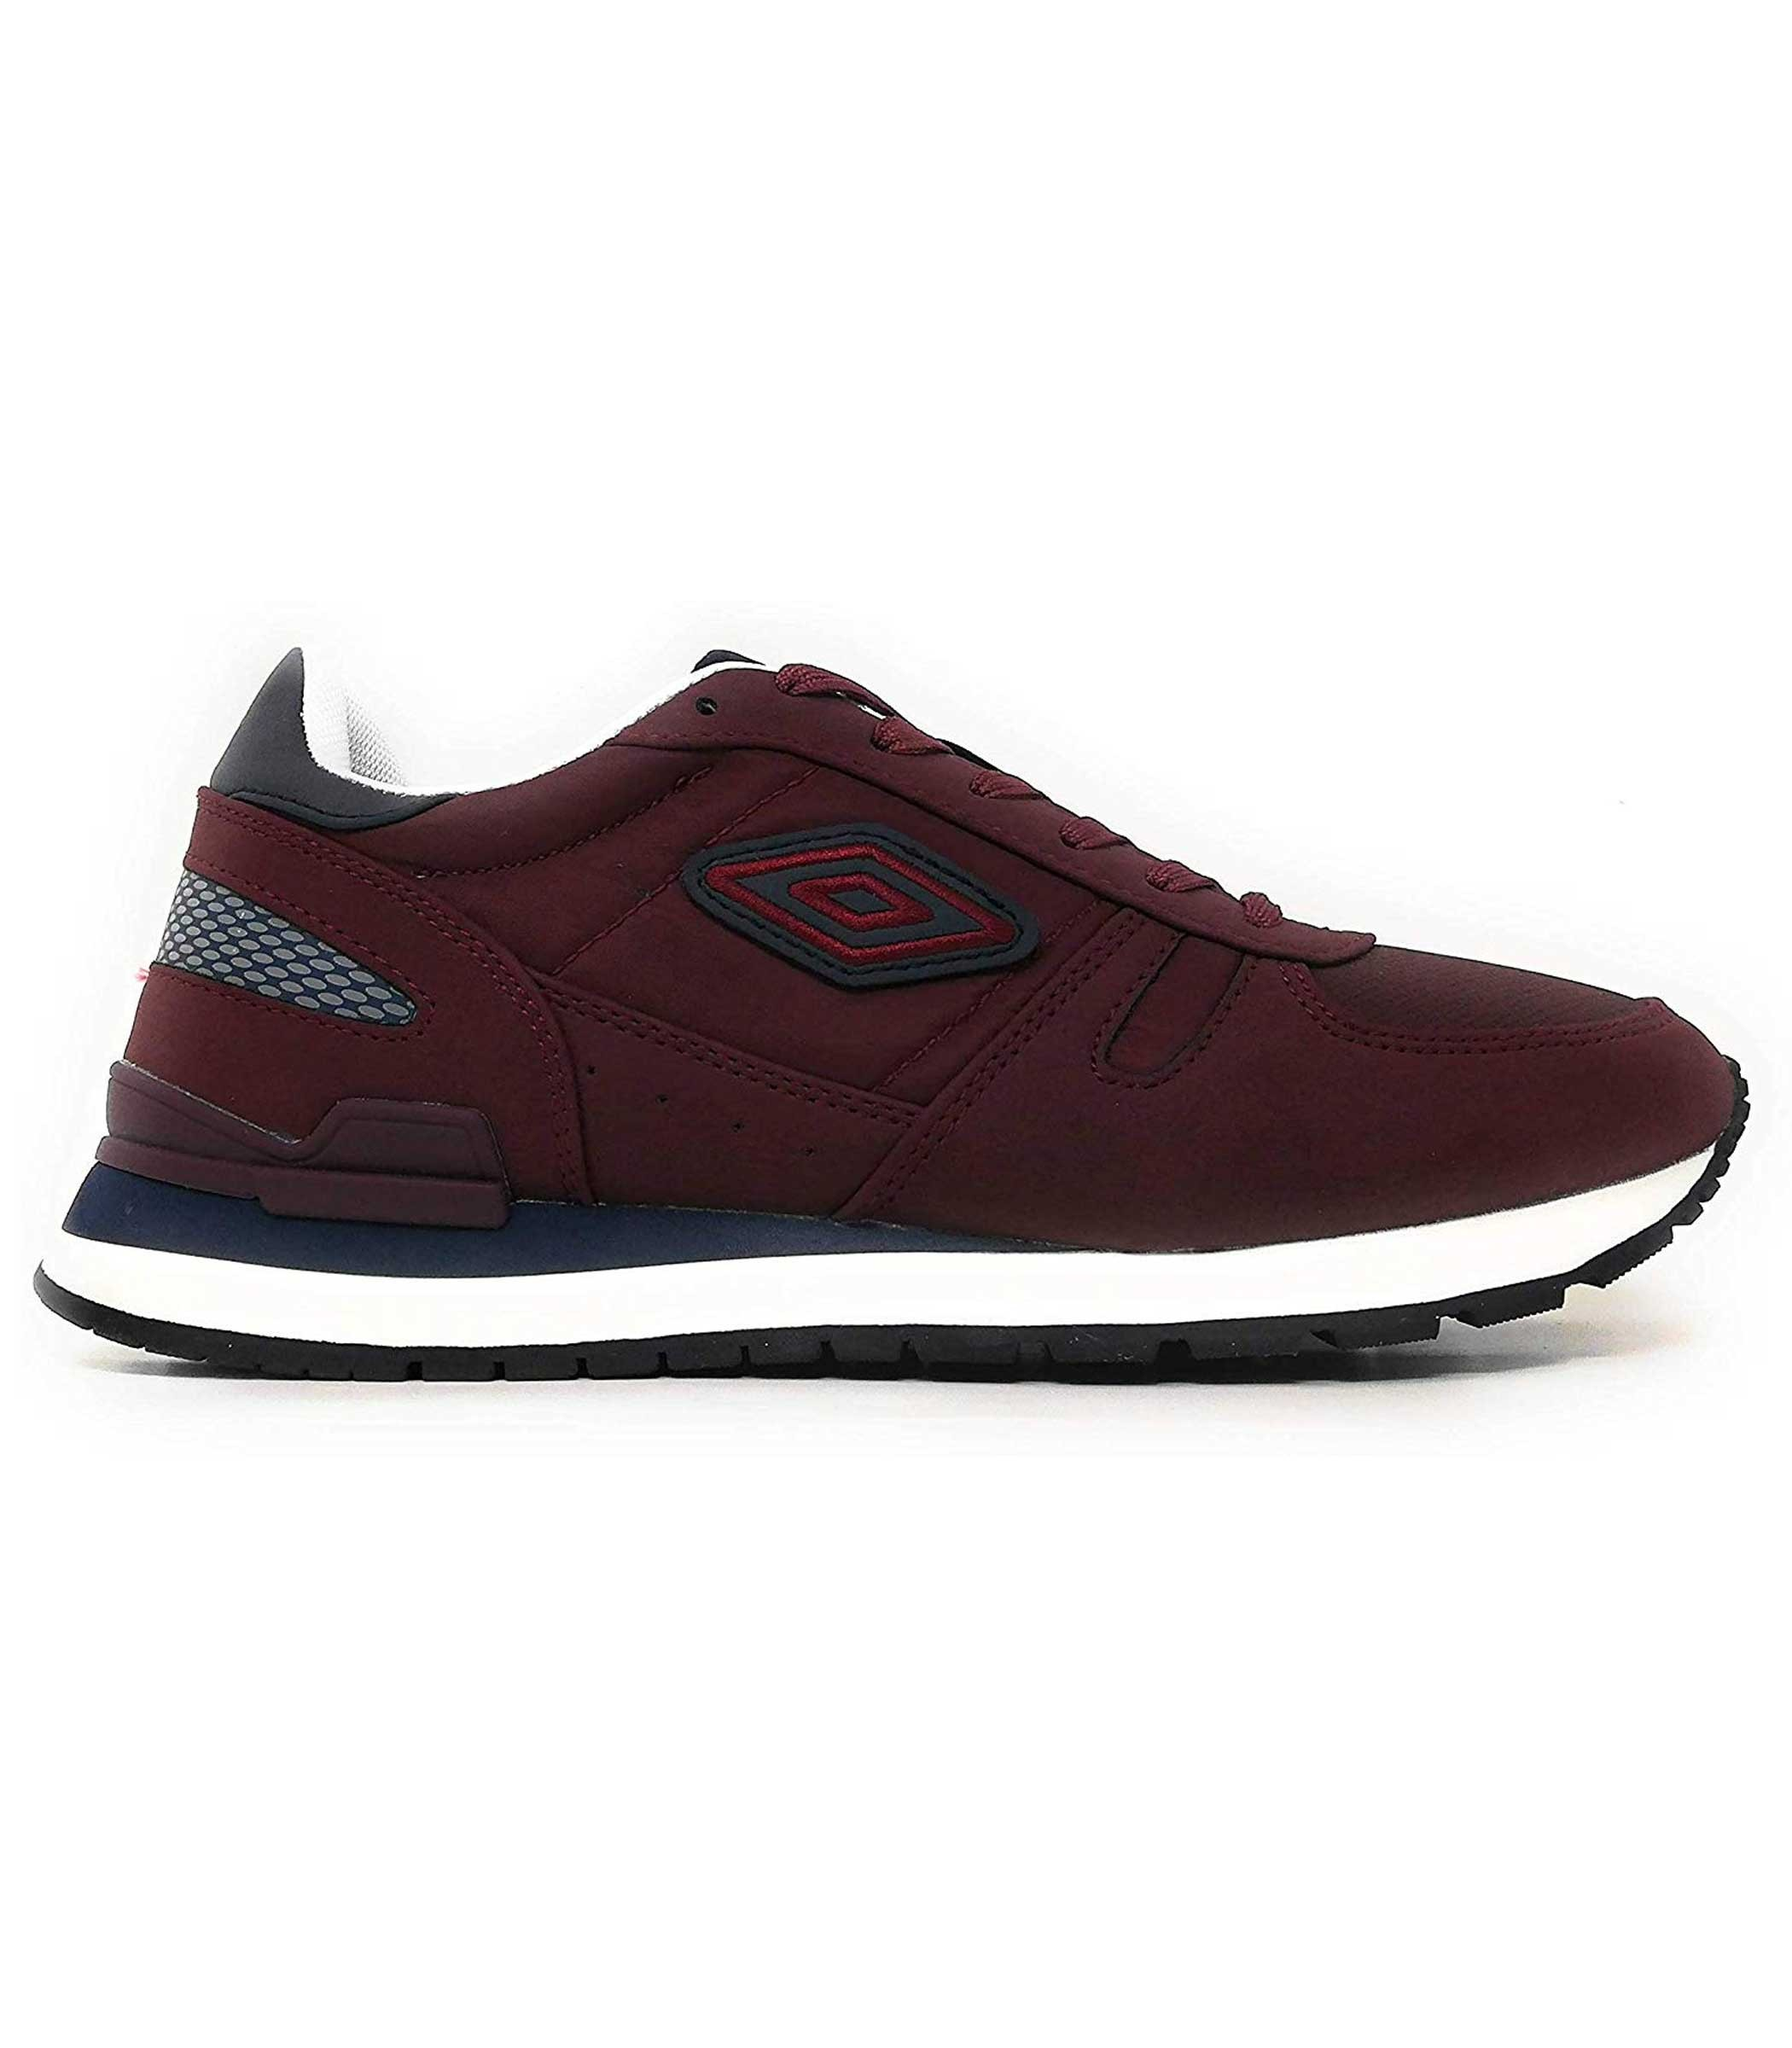 1881042f590d Eva Umbro Rfp38005s Sneakers Jogging Scarpe Rif Da Uomo aR4EUwwxq